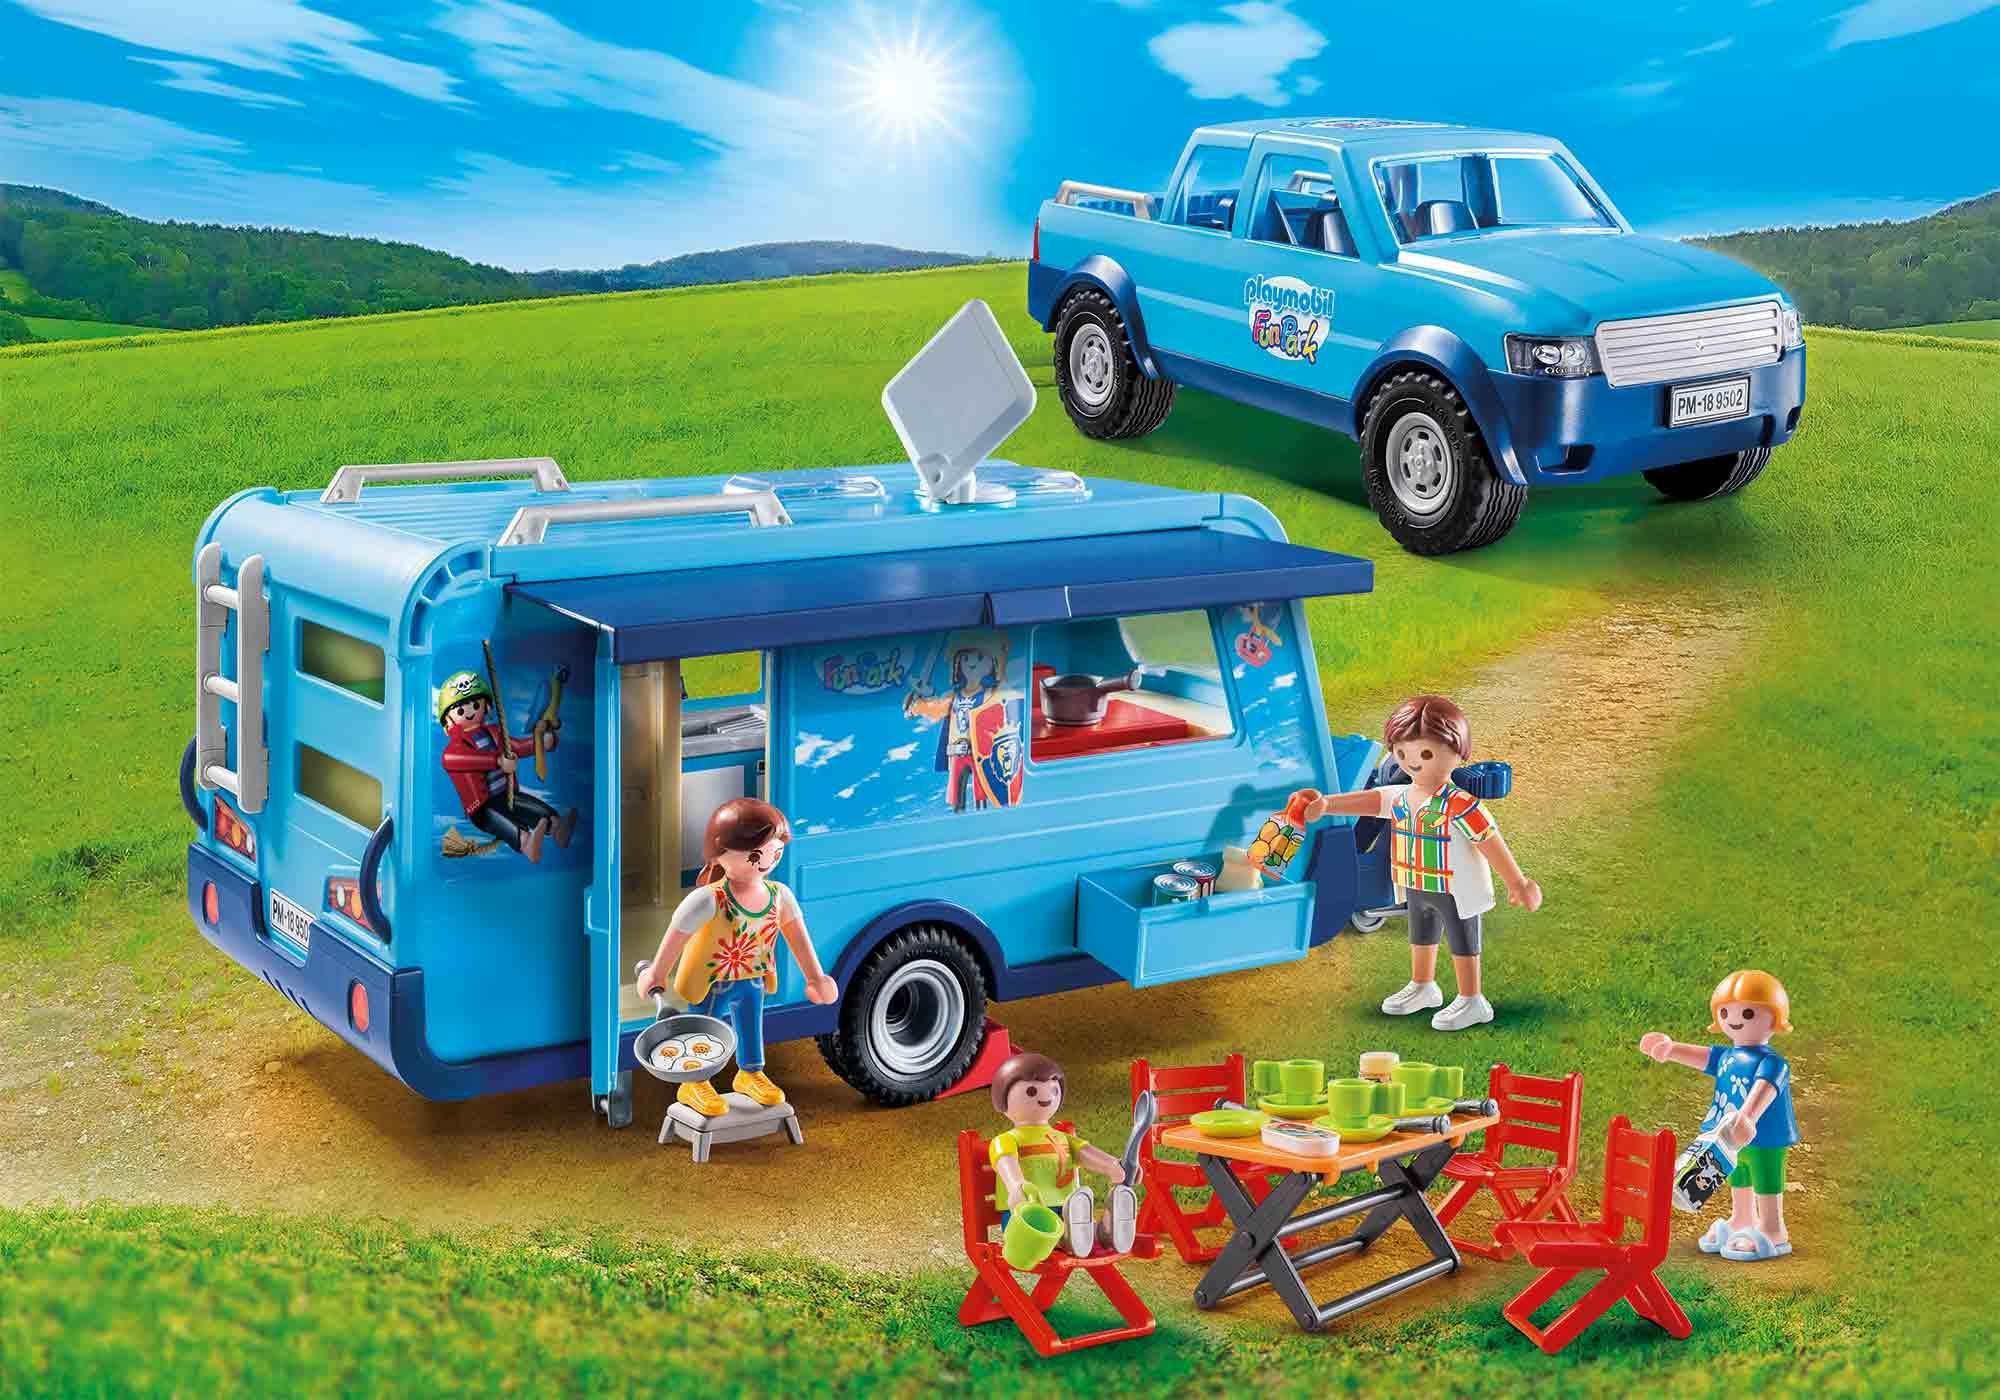 9502_product_detail/PLAYMOBIL-FunPark Pick-Up mit Wohnwagen